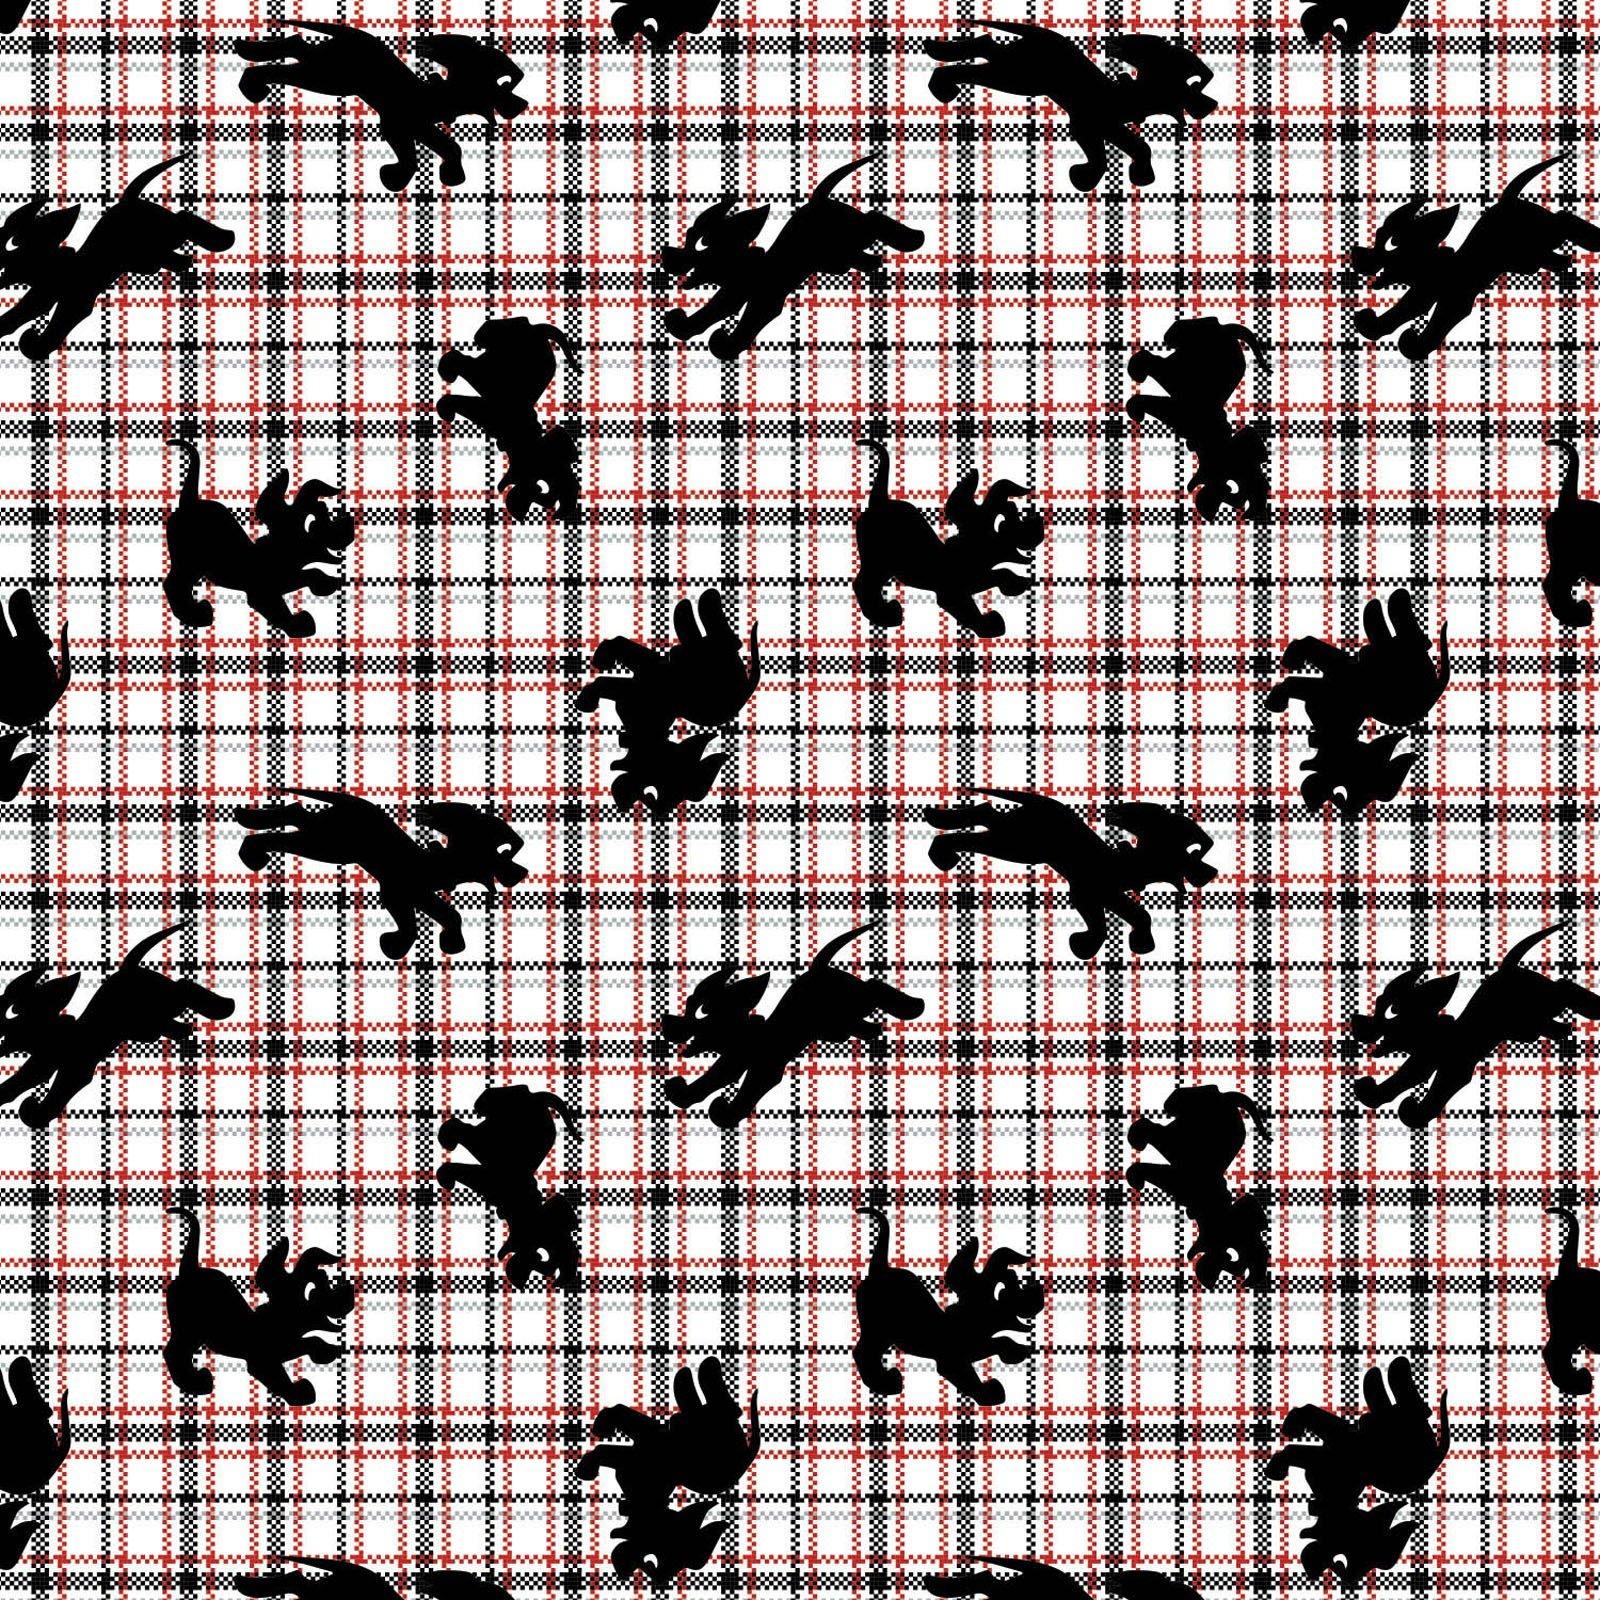 Camelot Fabrics Disney 101 Dalmatians Family Portrait 85010202 2 Puppy Plaid $11.50/yd